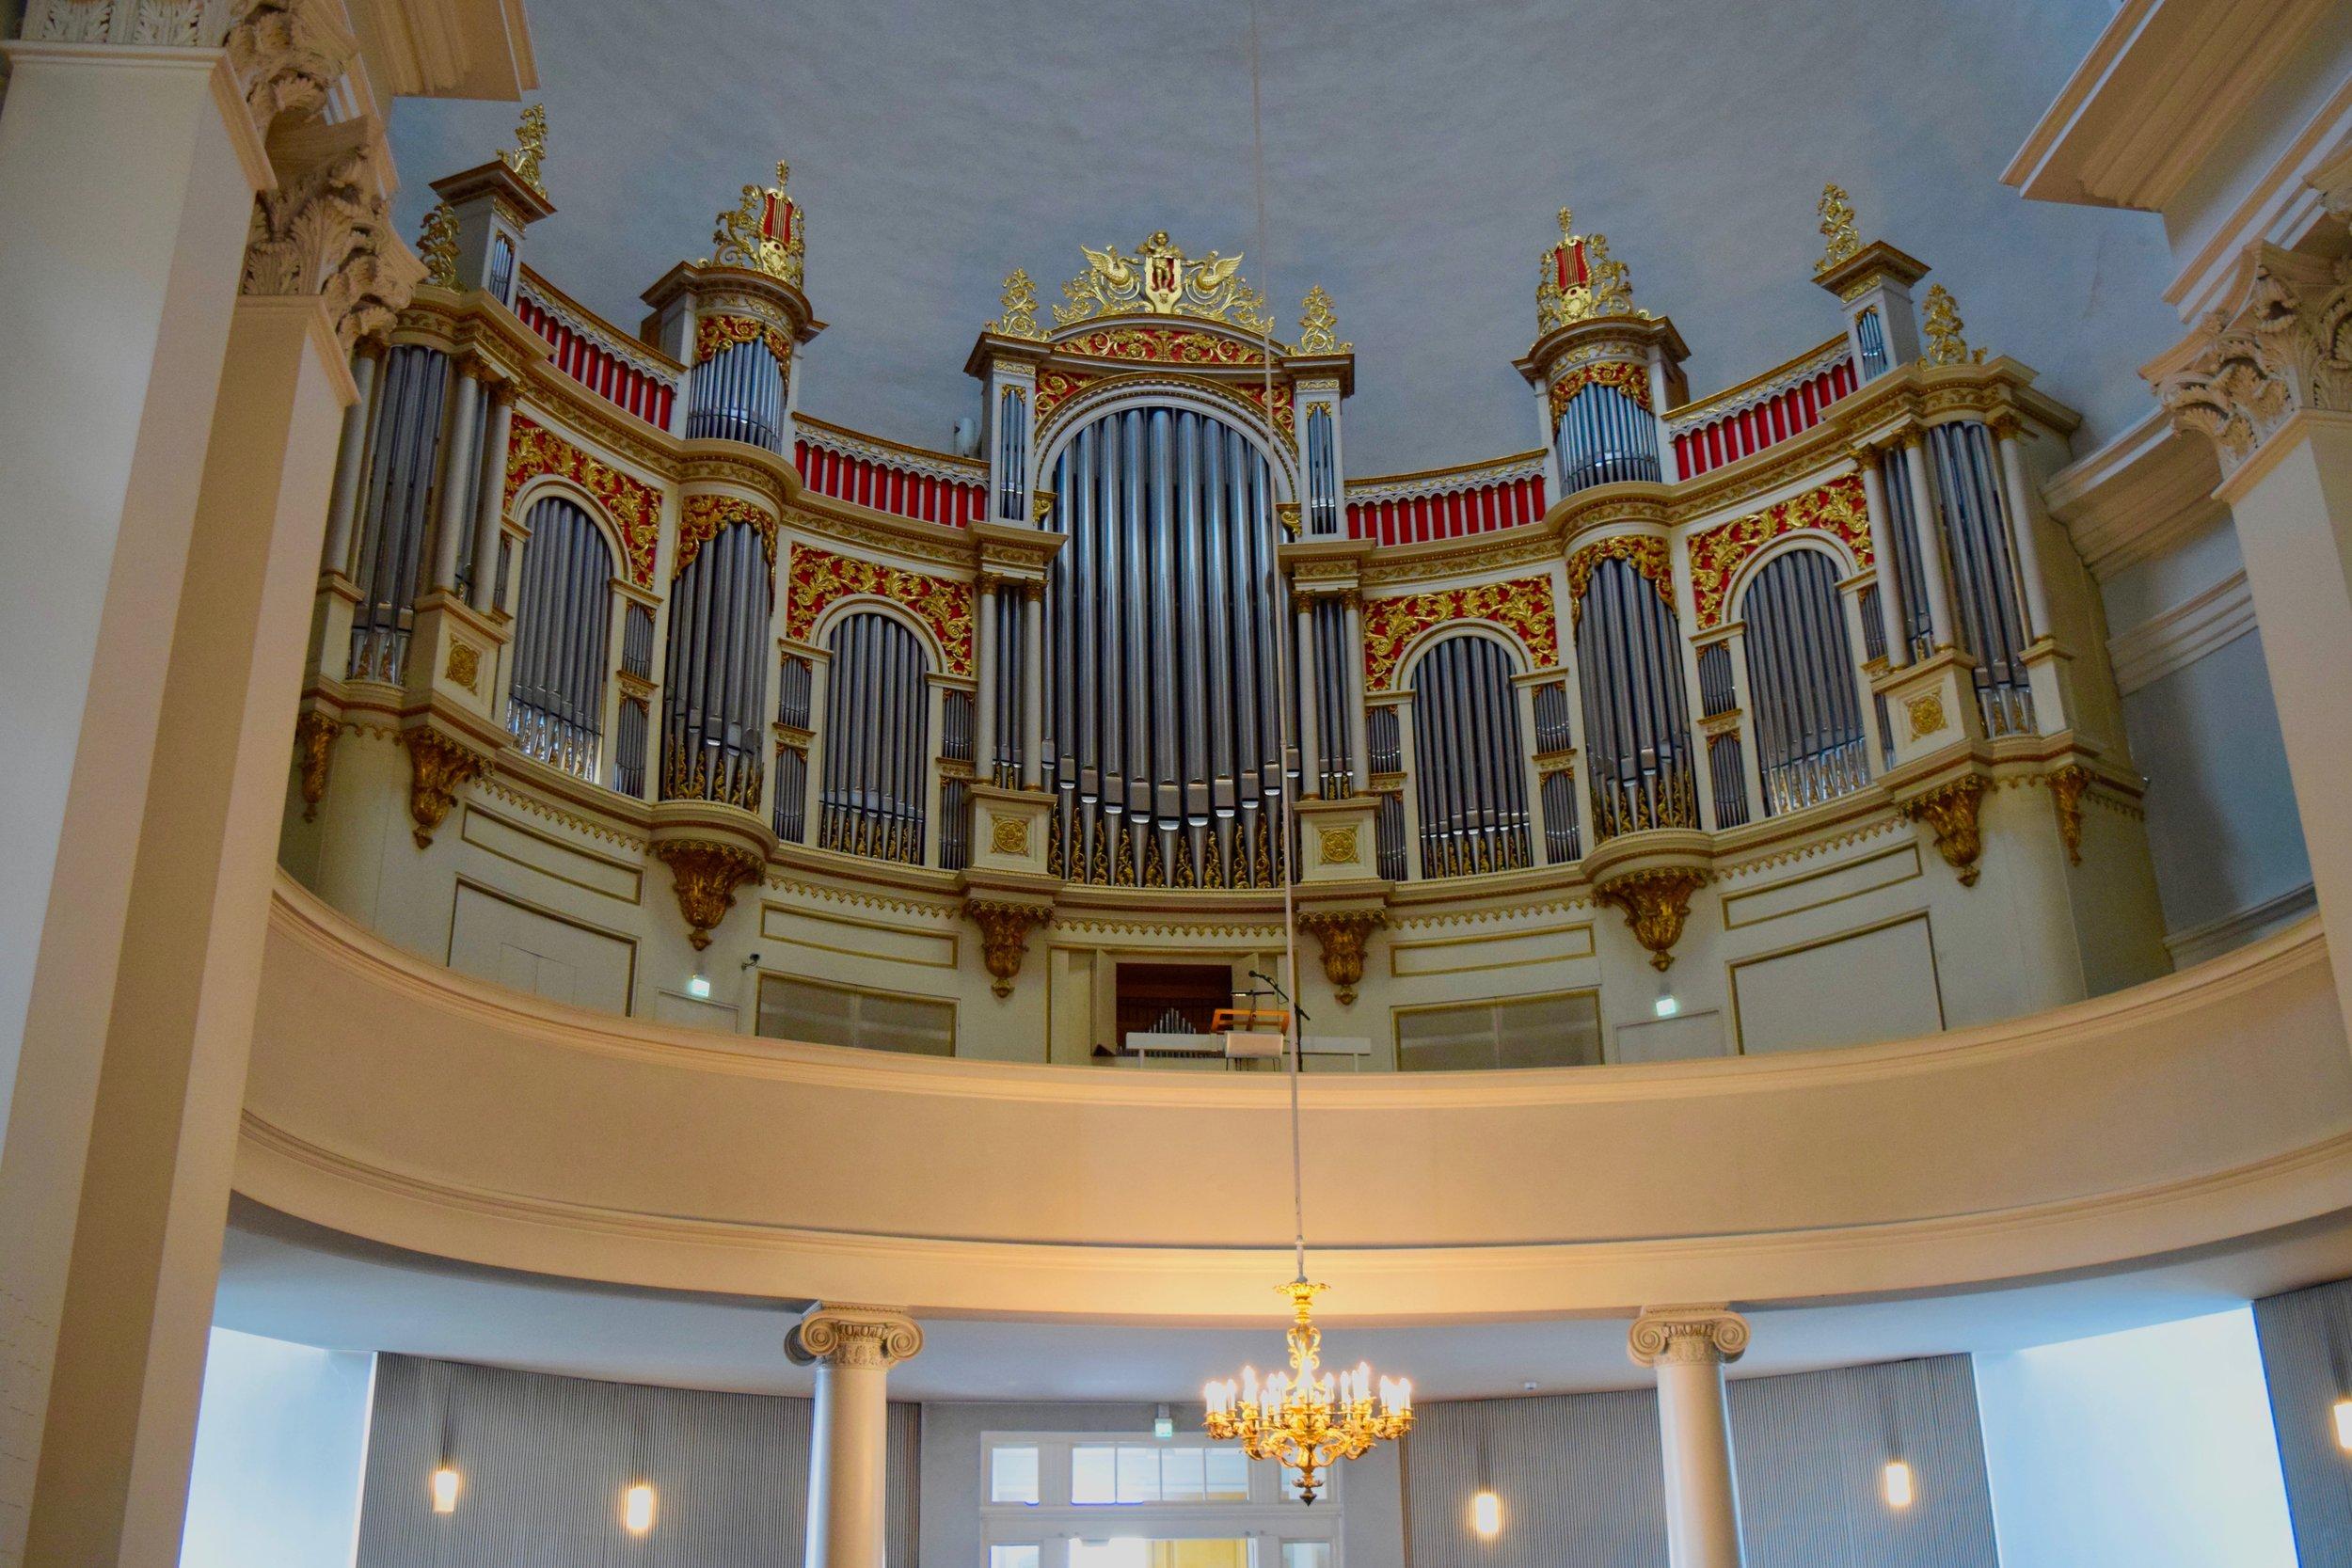 Cathedral's Organ